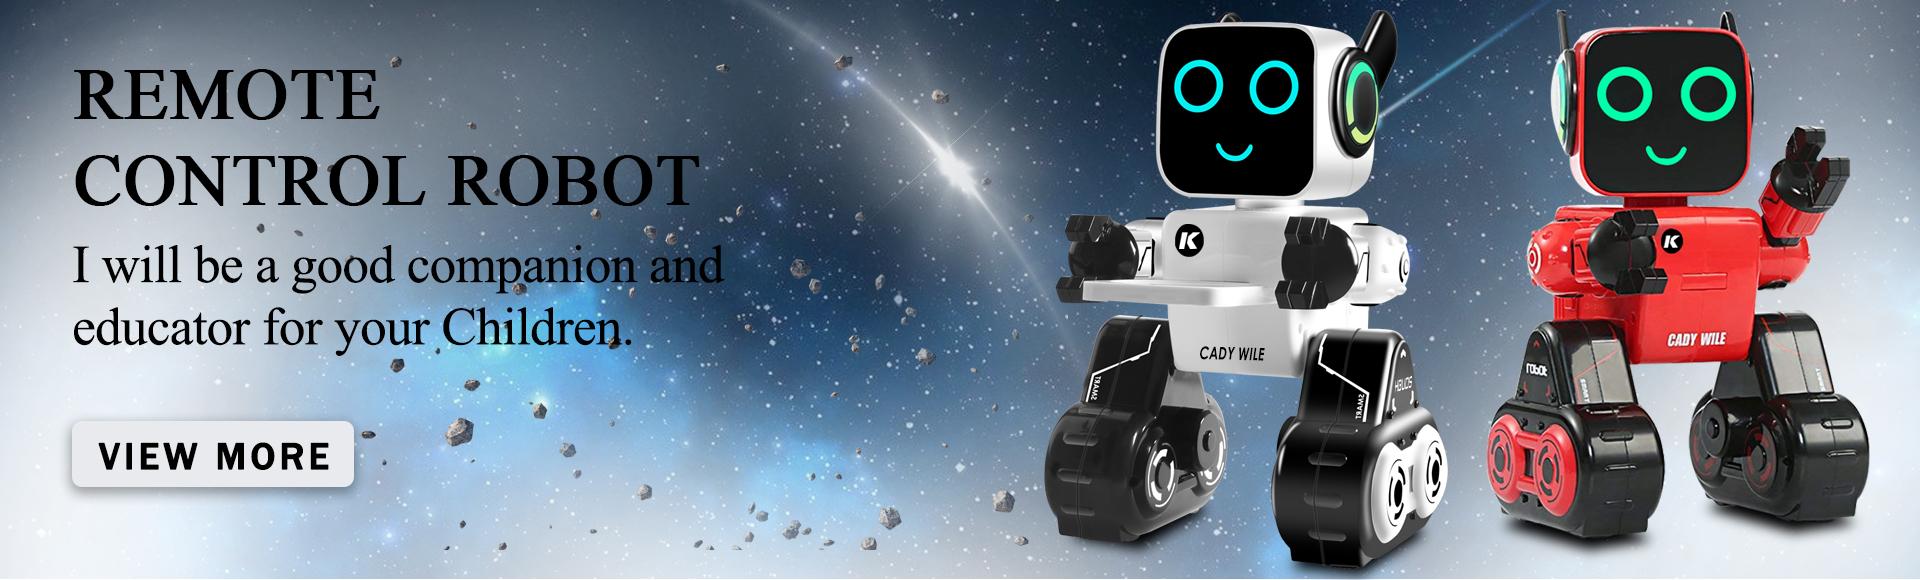 Hbuds Bluetooth Headphones Waterproof IPX7,Wireless Sport Earbuds